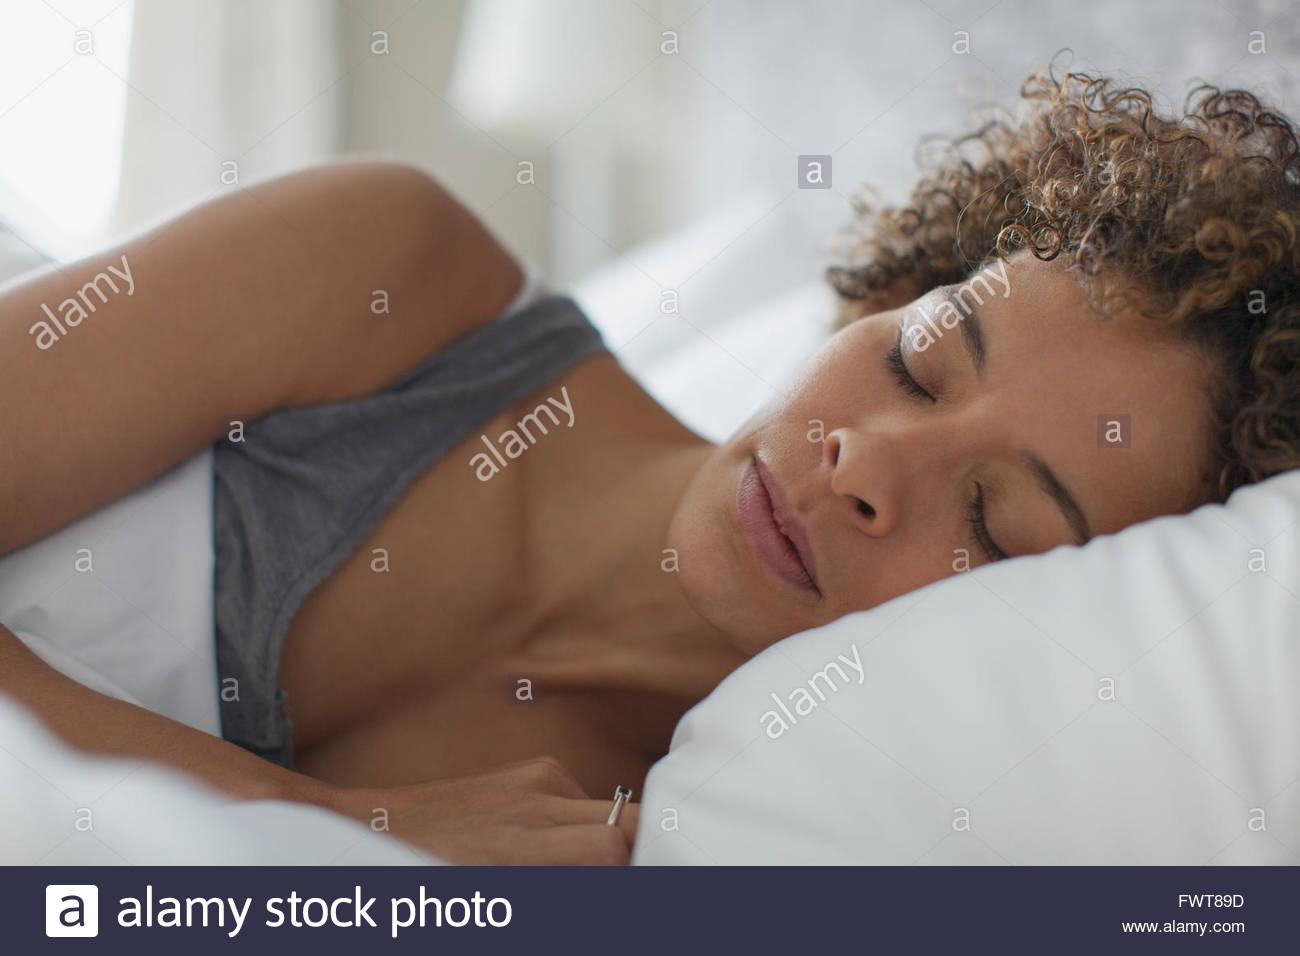 Hübsche Frau im Bett ruhen. Stockbild